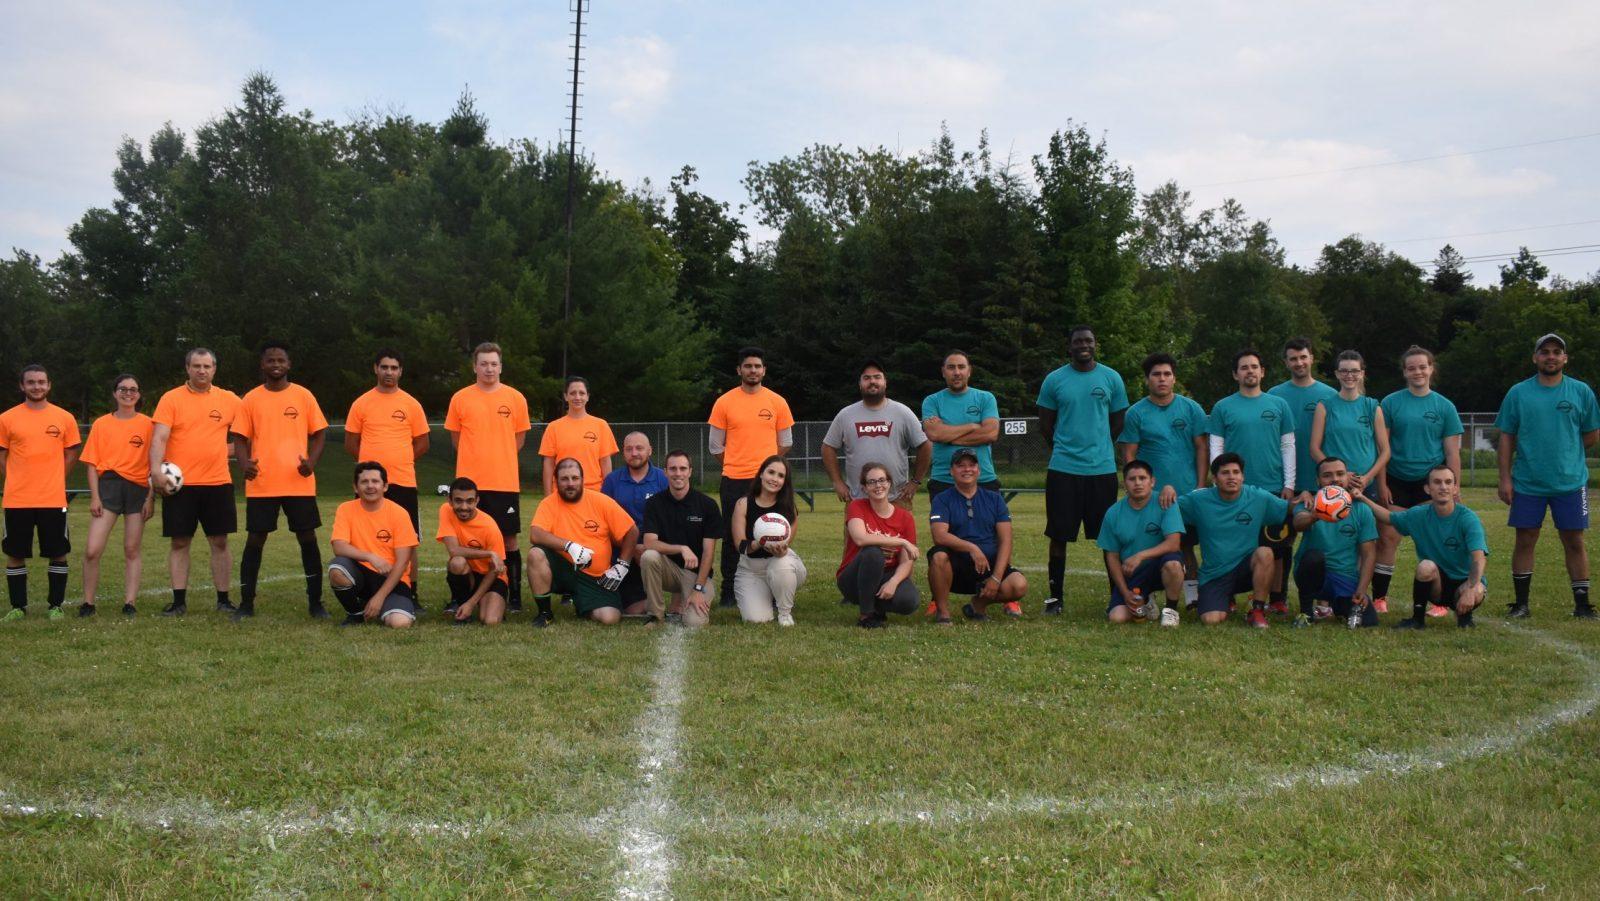 Inauguration de la ligue de soccer interculturelle